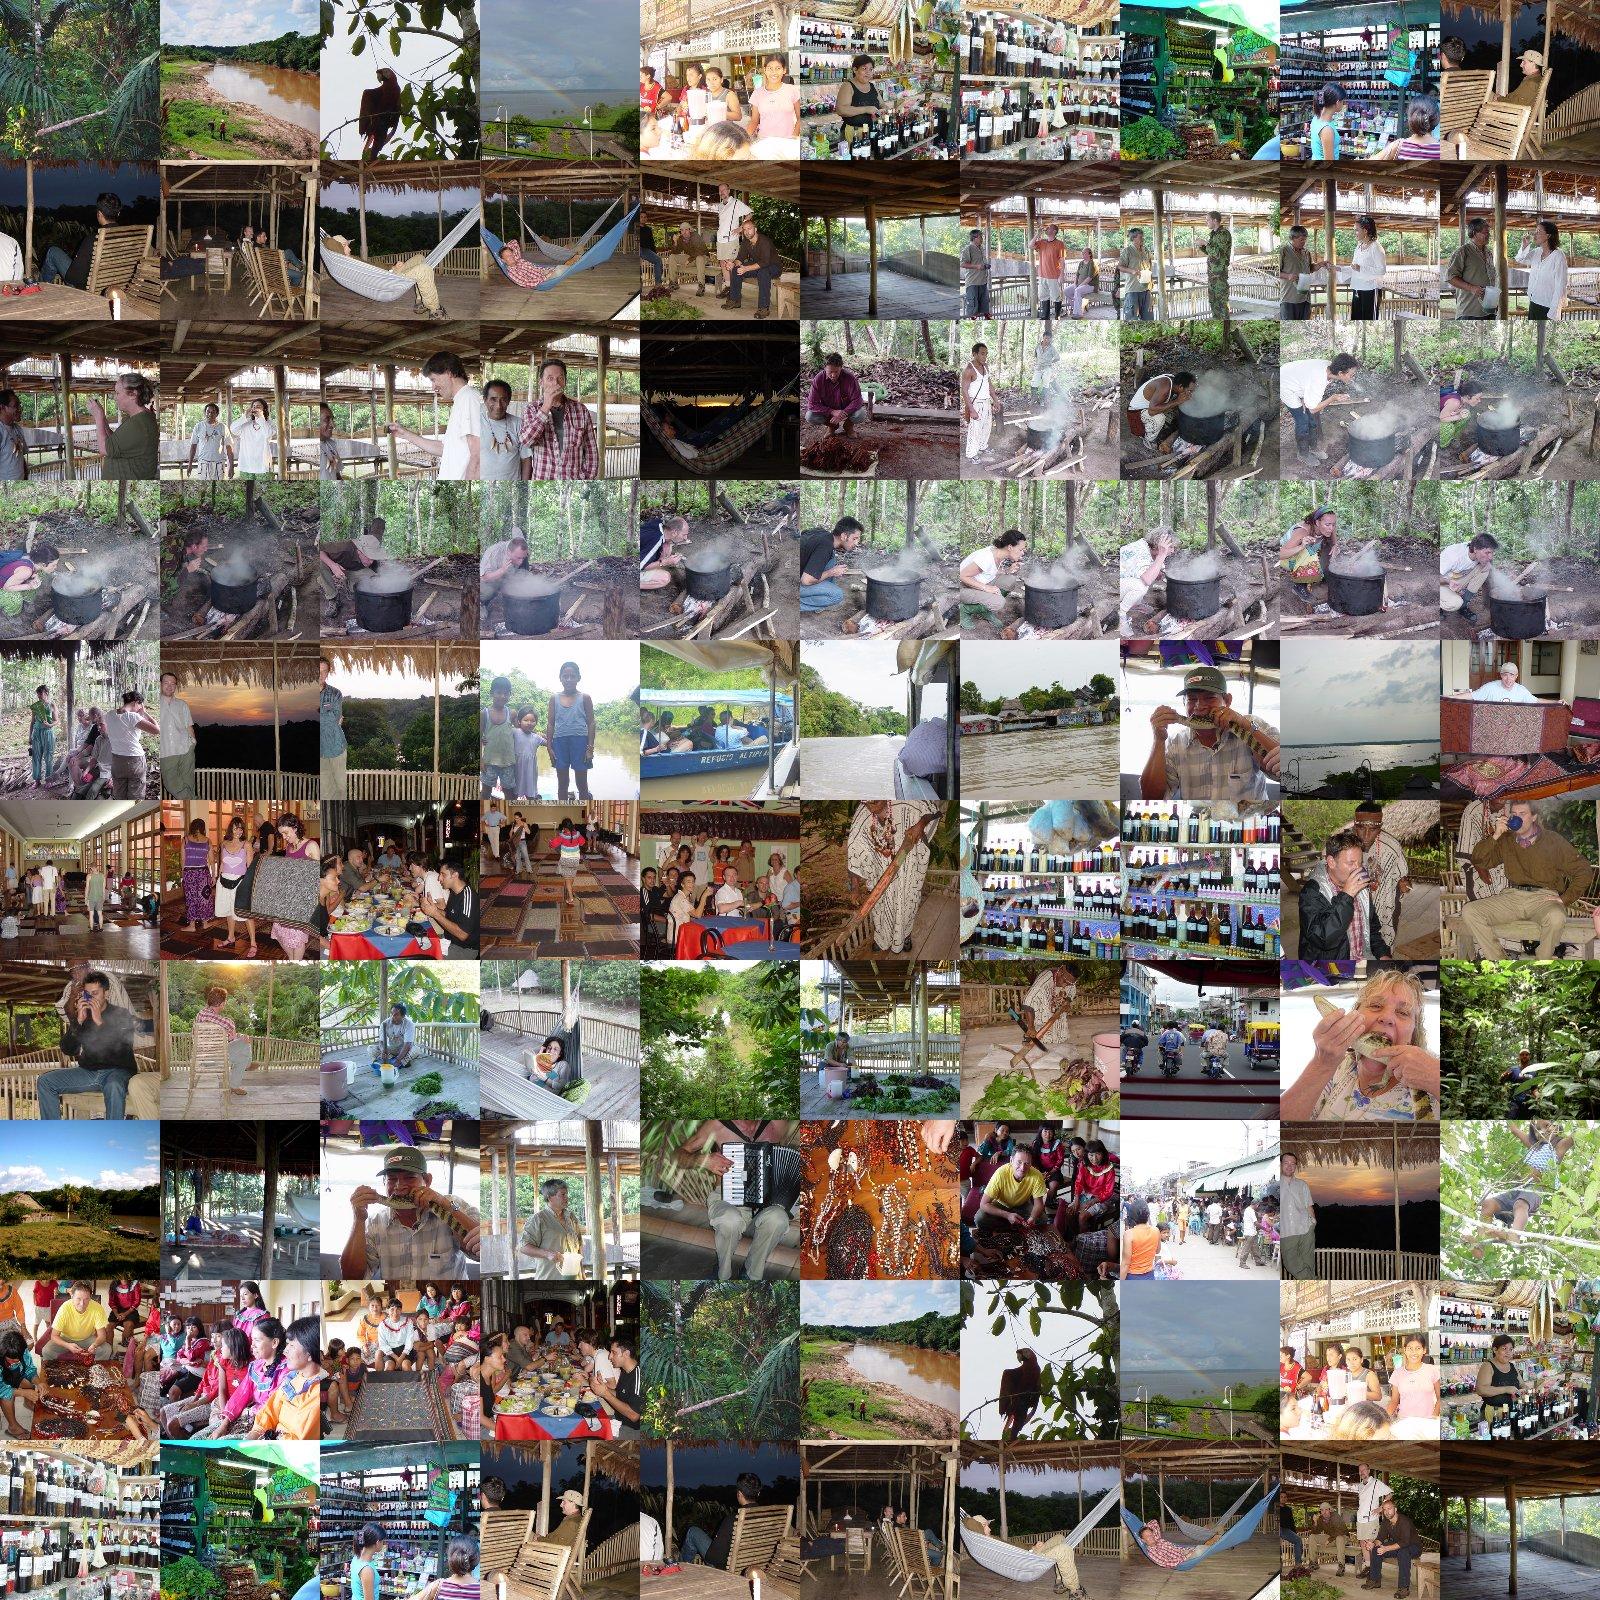 amazon rainforest plants collage. ayahuasca retreat february 2003 amazon rainforest peru plants collage t